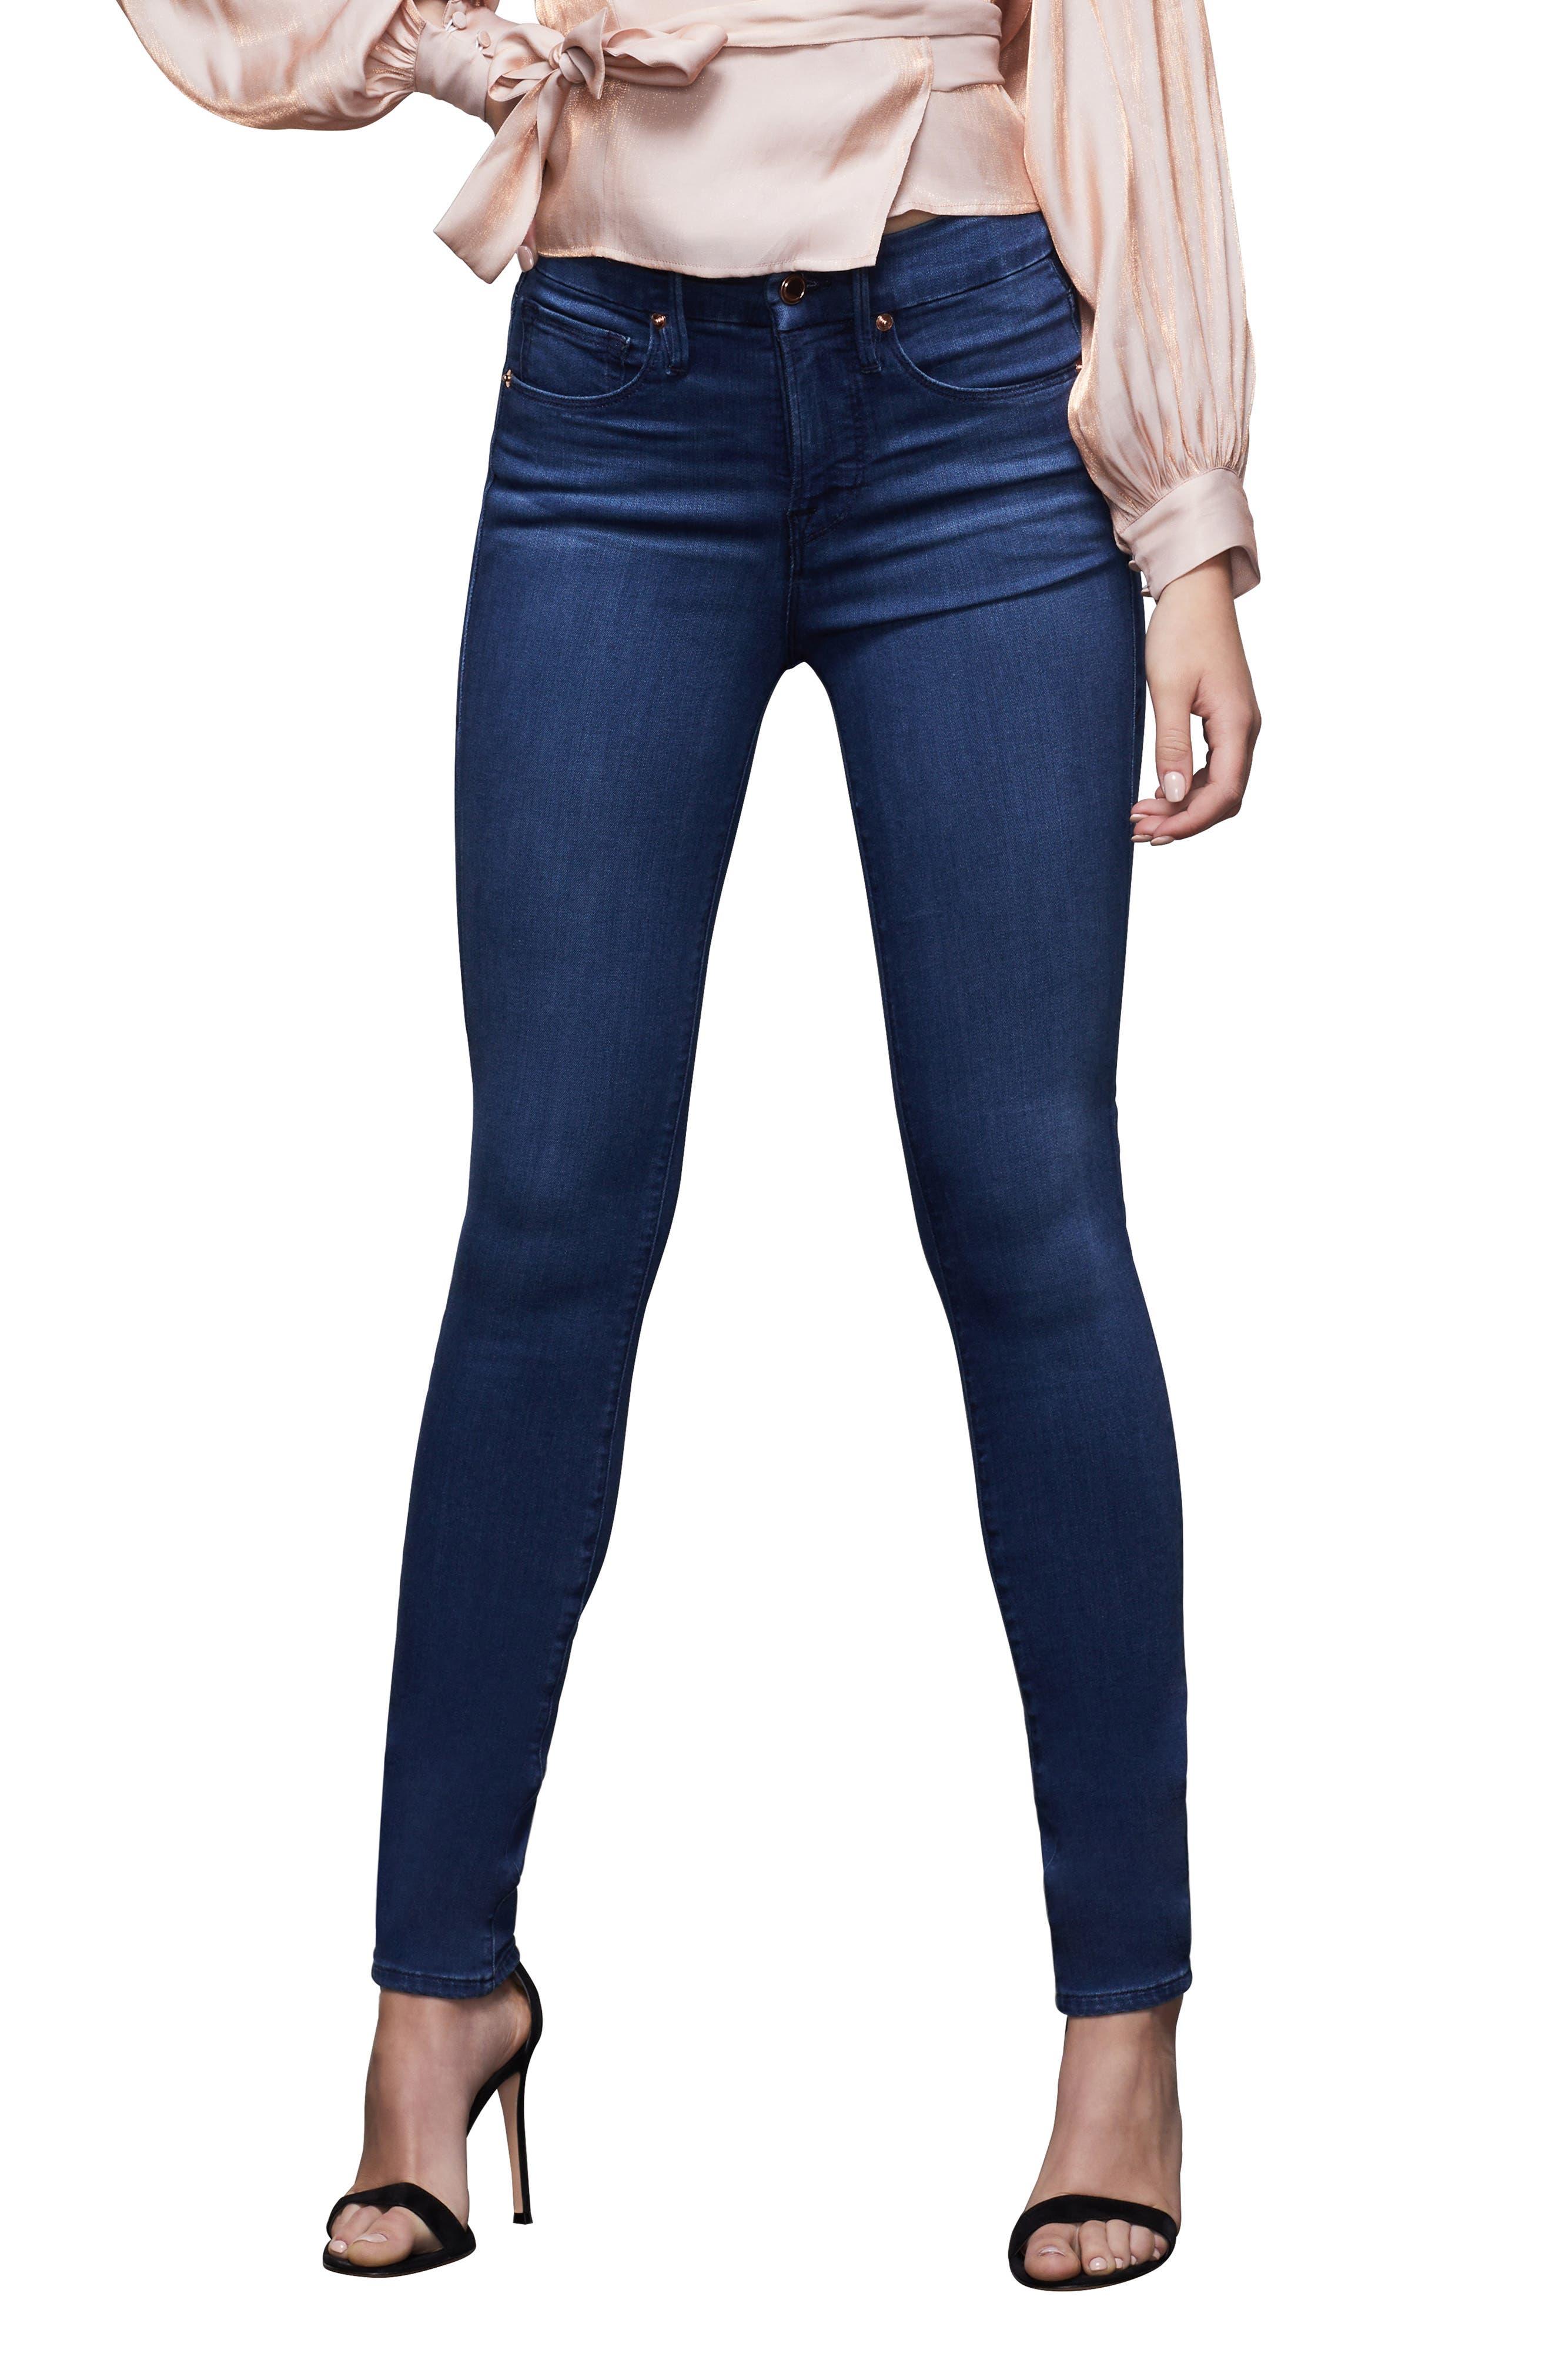 Women's Good American Good Legs High Waist Ankle Skinny Jeans